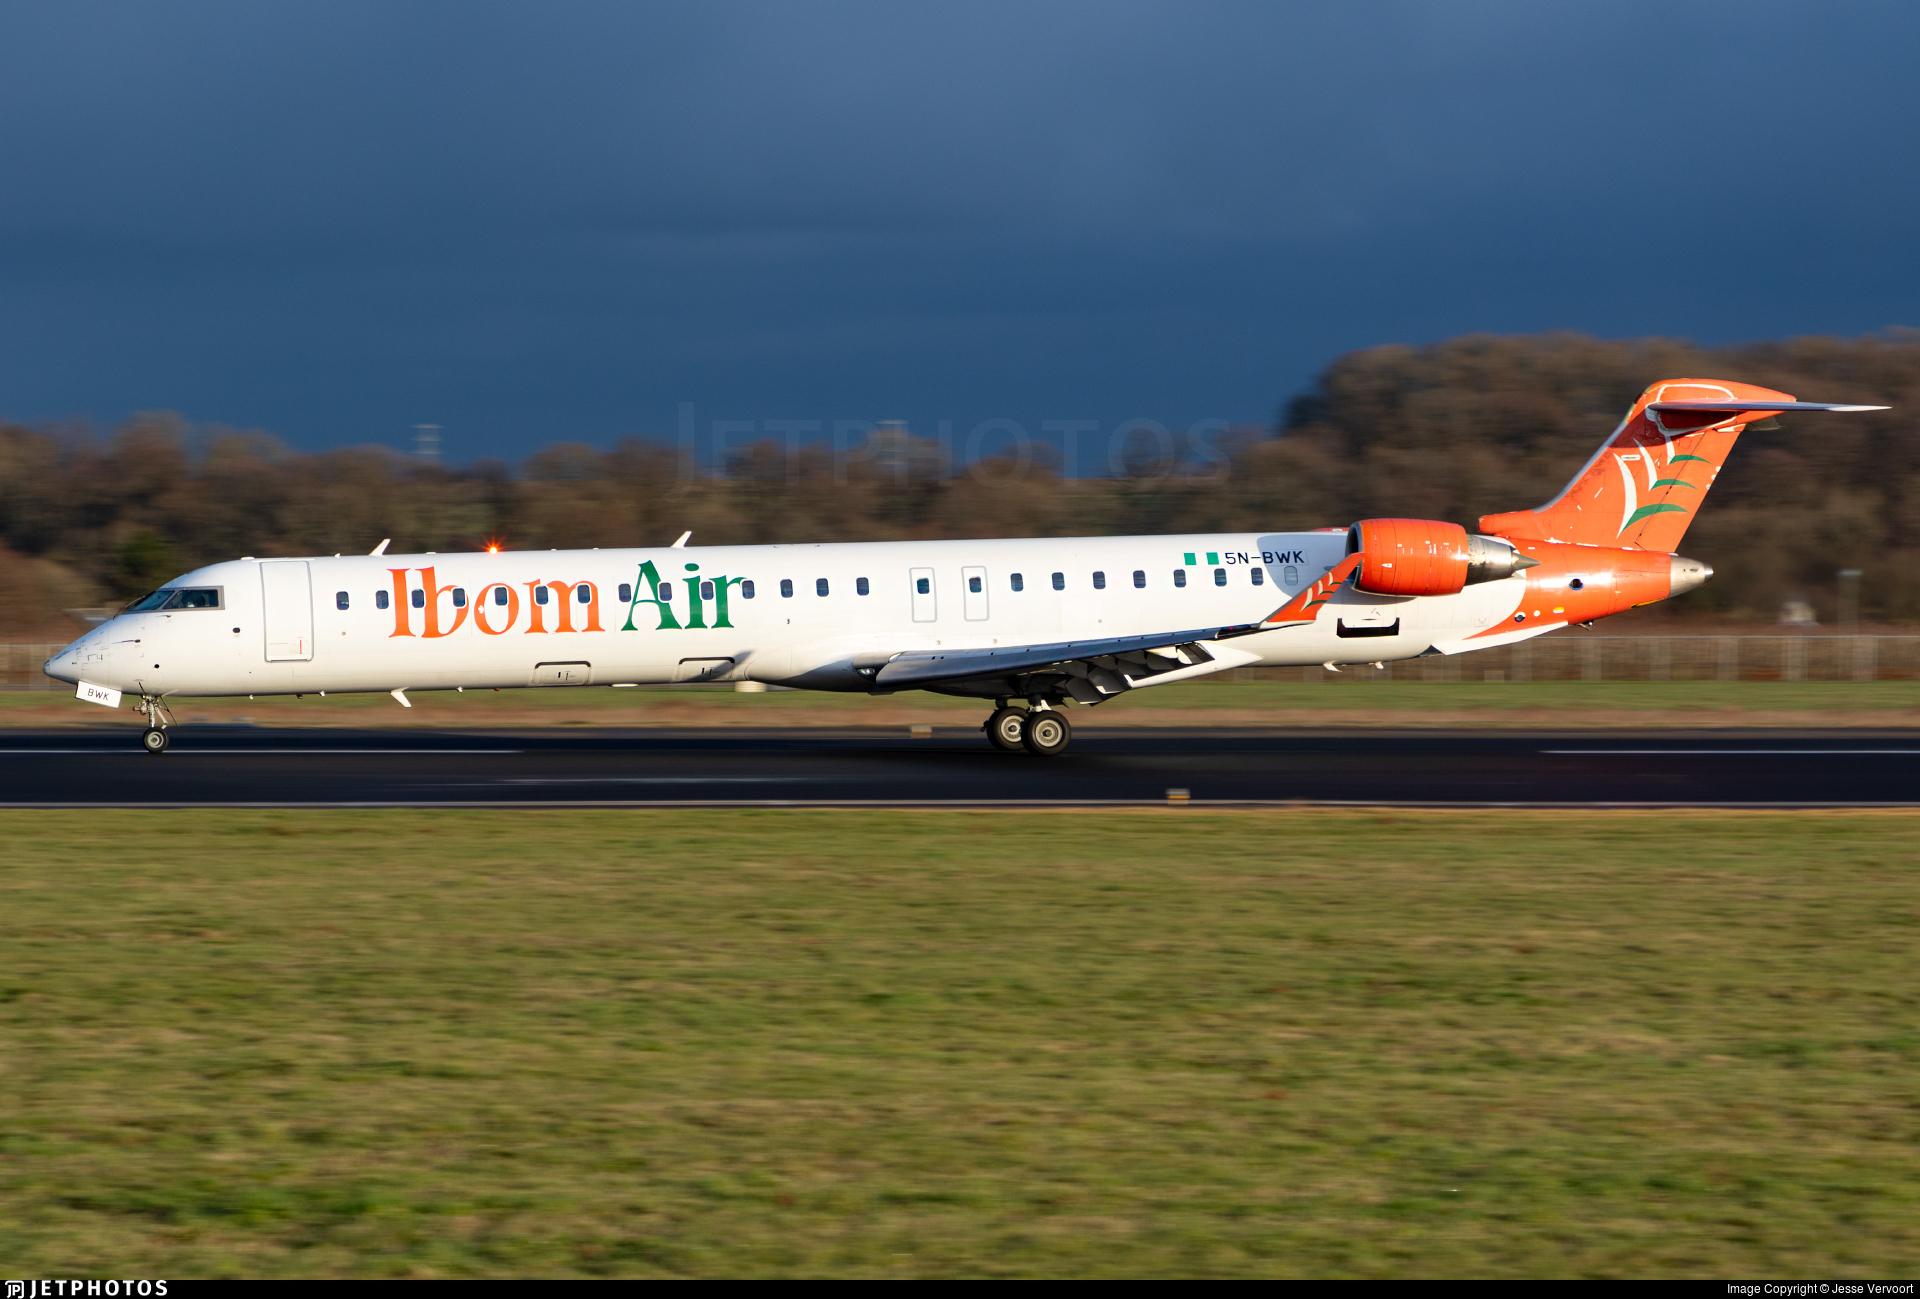 5N-BWK - Bombardier CRJ-900 - Ibom Air